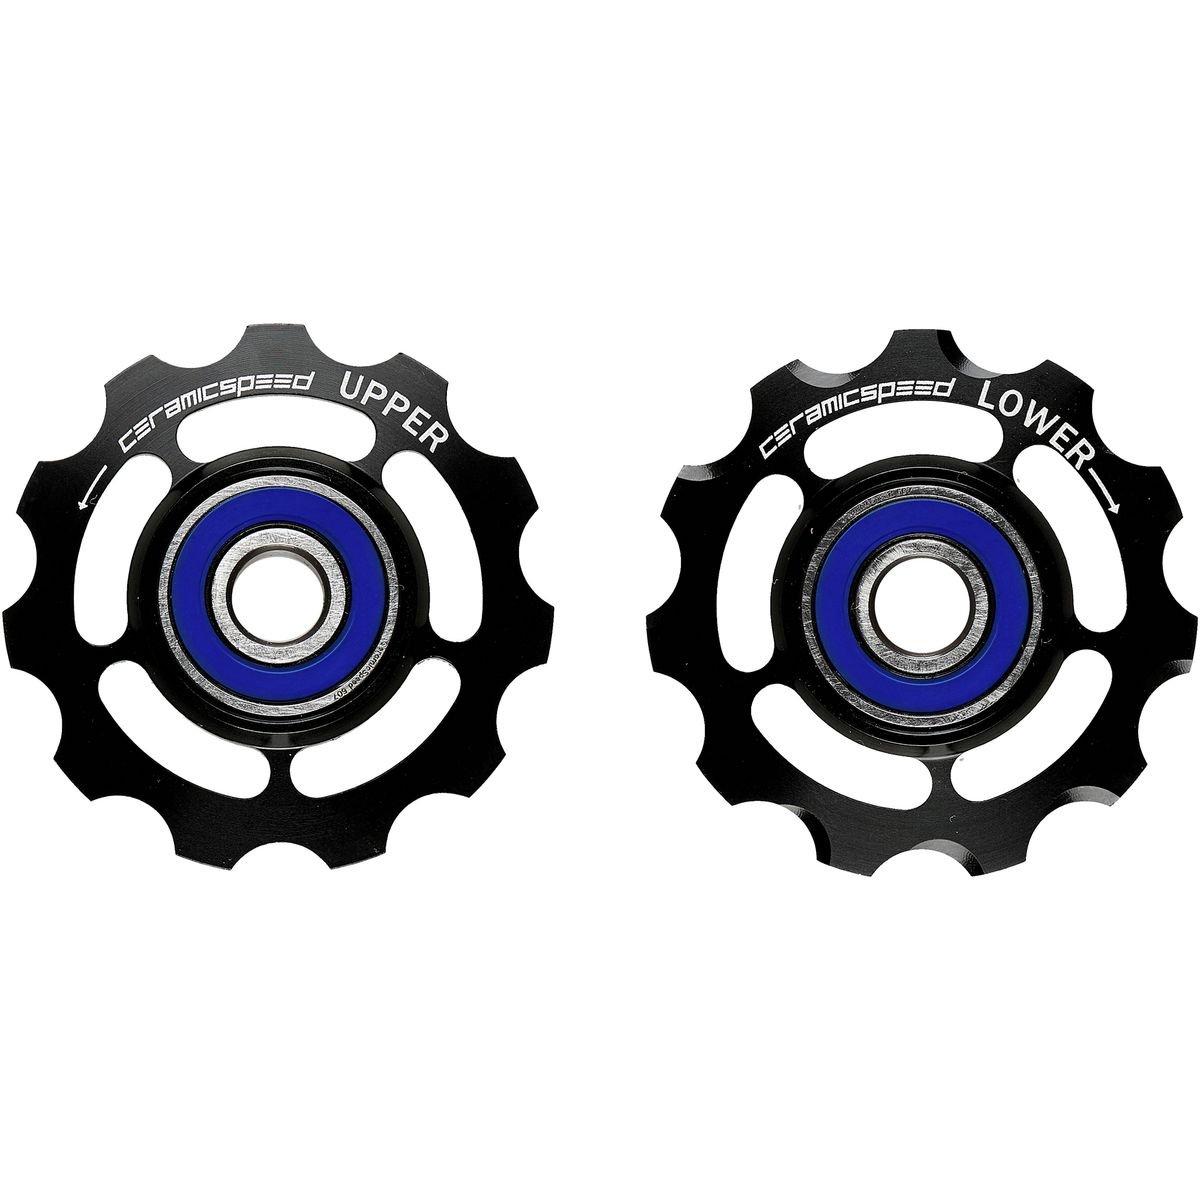 CeramicSpeed 11速度アルミニウムプーリホイール B00VVW7DPG SRAM, 11 Speed|ブラック ブラック SRAM, 11 Speed